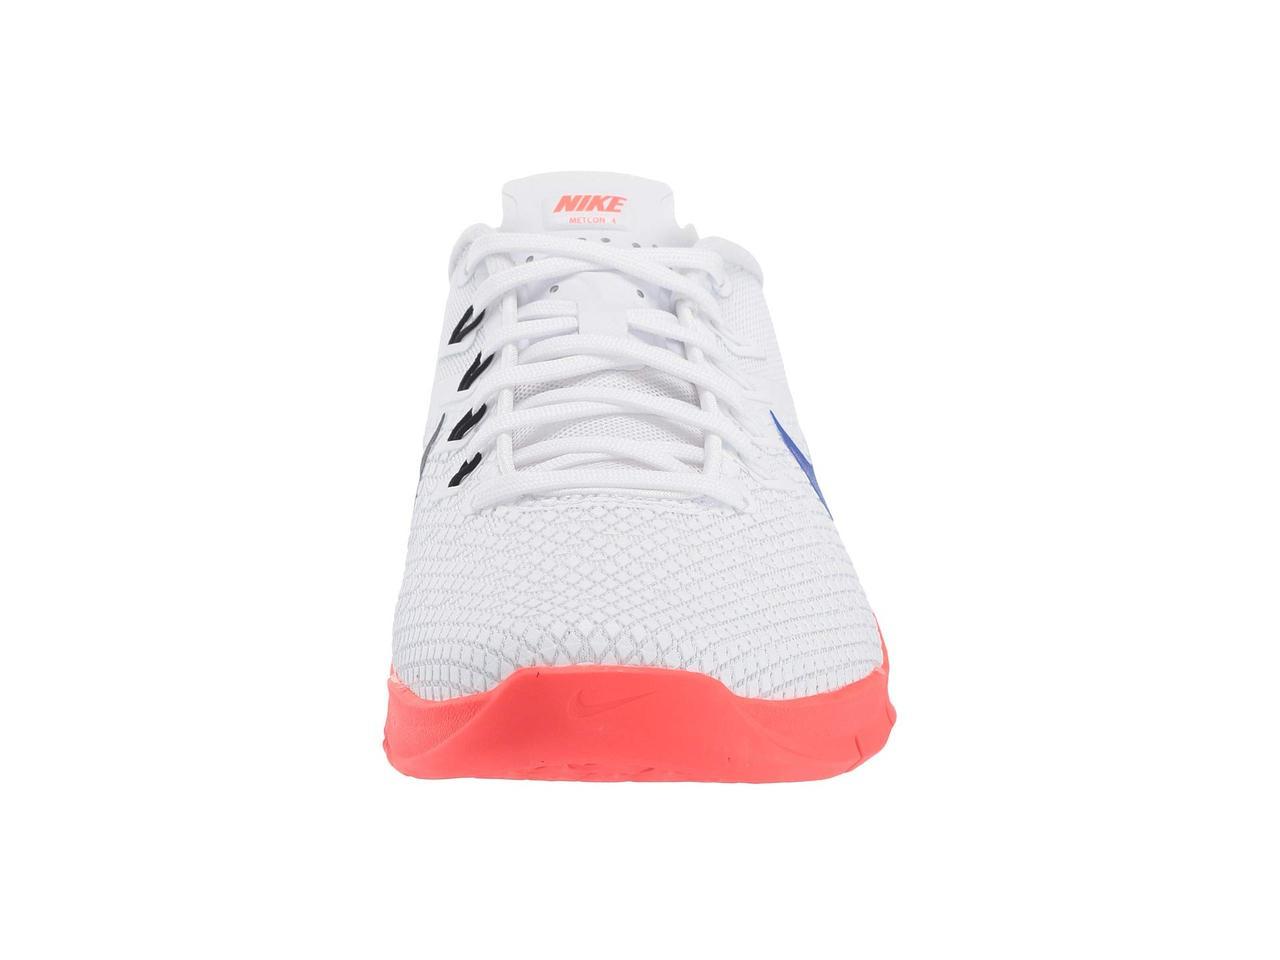 befc4544c1ee Кроссовки Кеды (Оригинал) Nike Metcon 4 XD White Racer Blue Flash ...